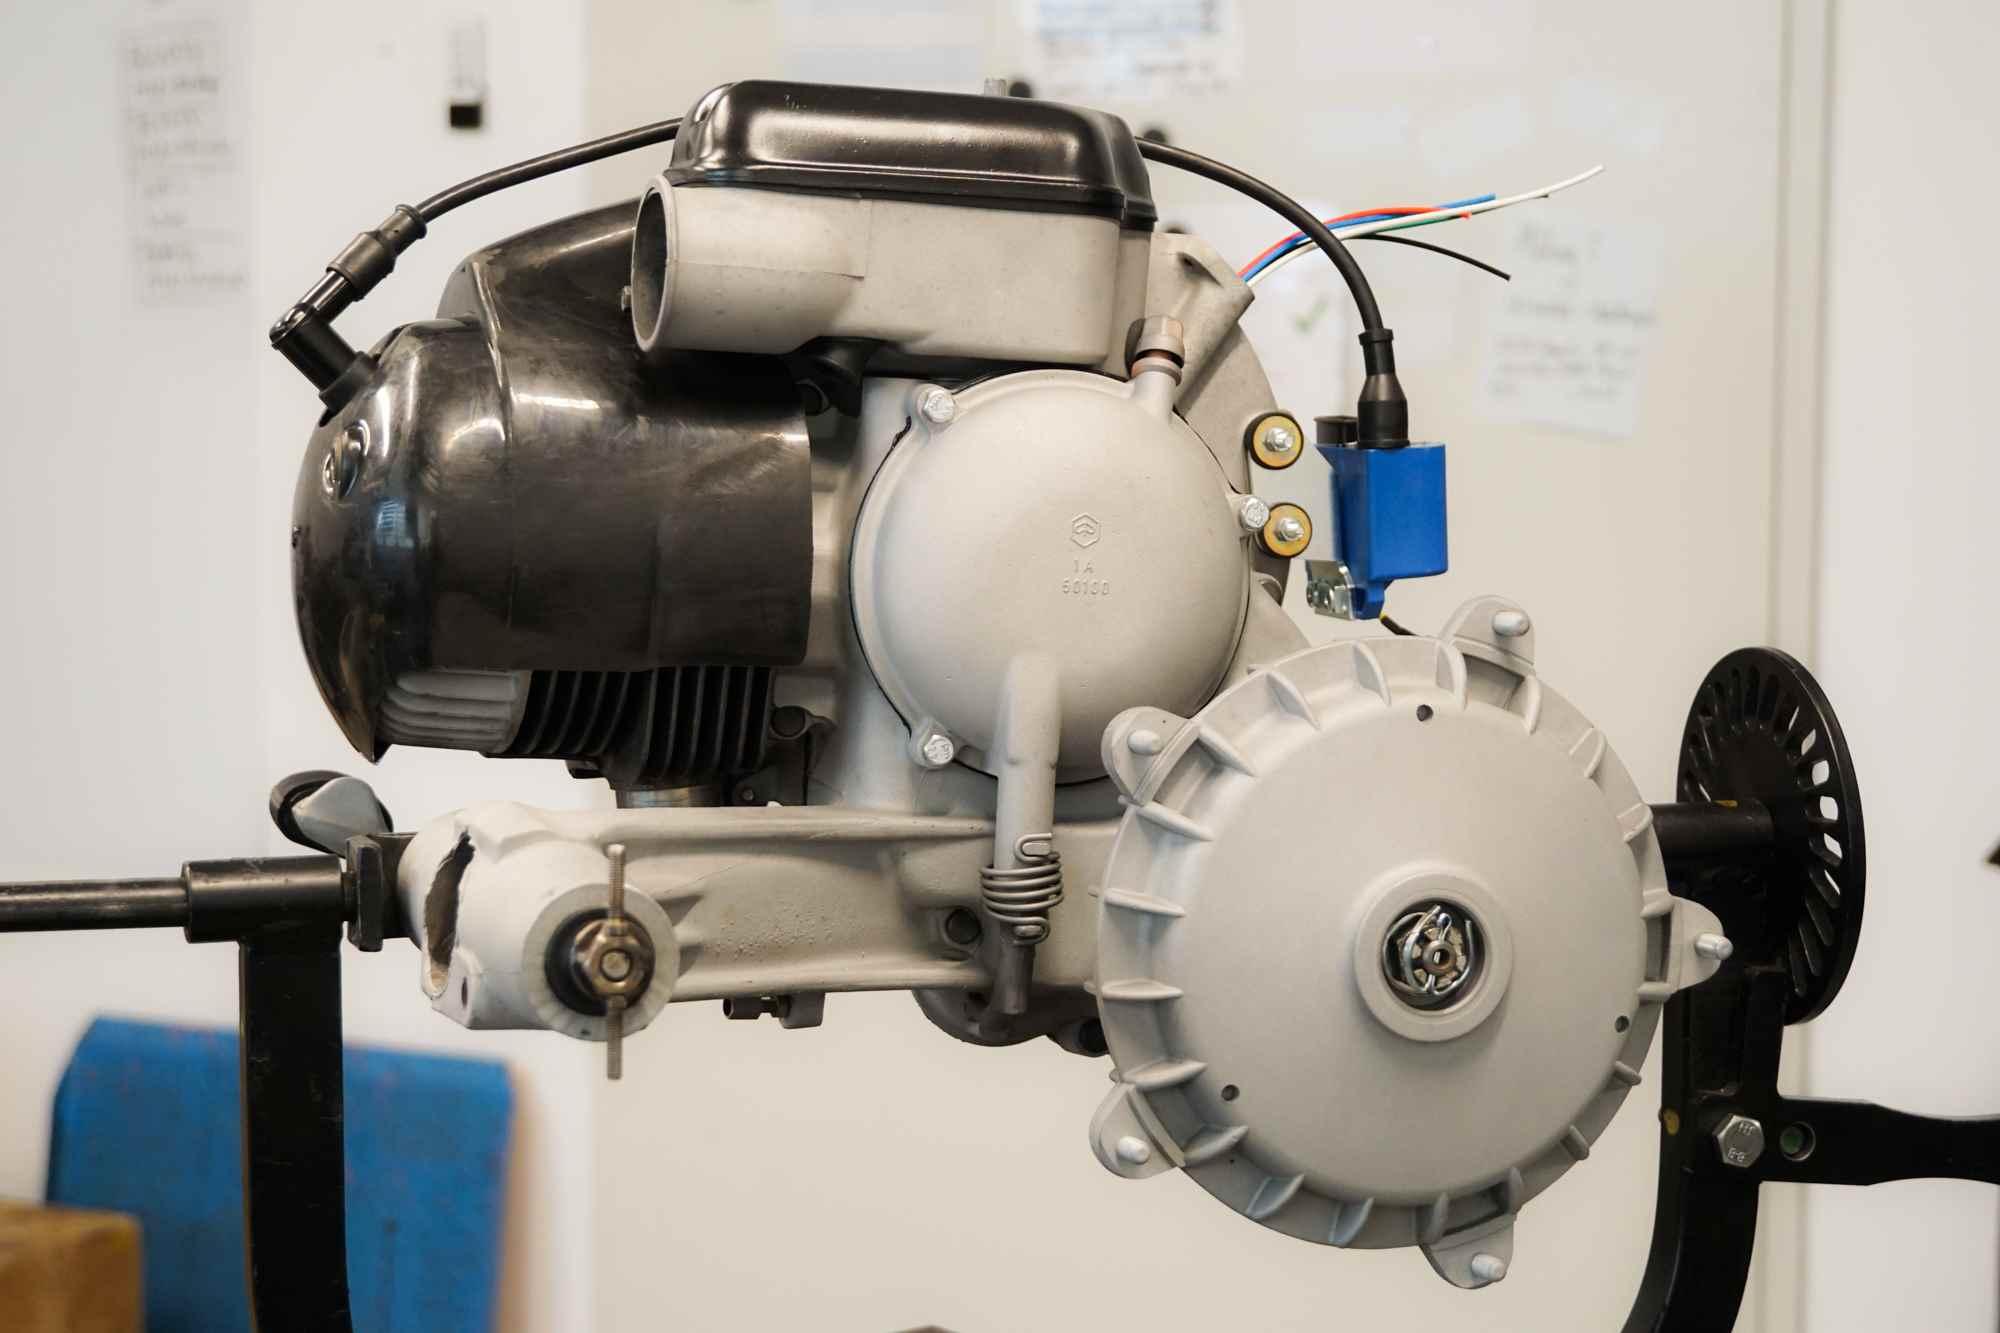 Perfekter Vespa Largeframe Motor nach Überholung